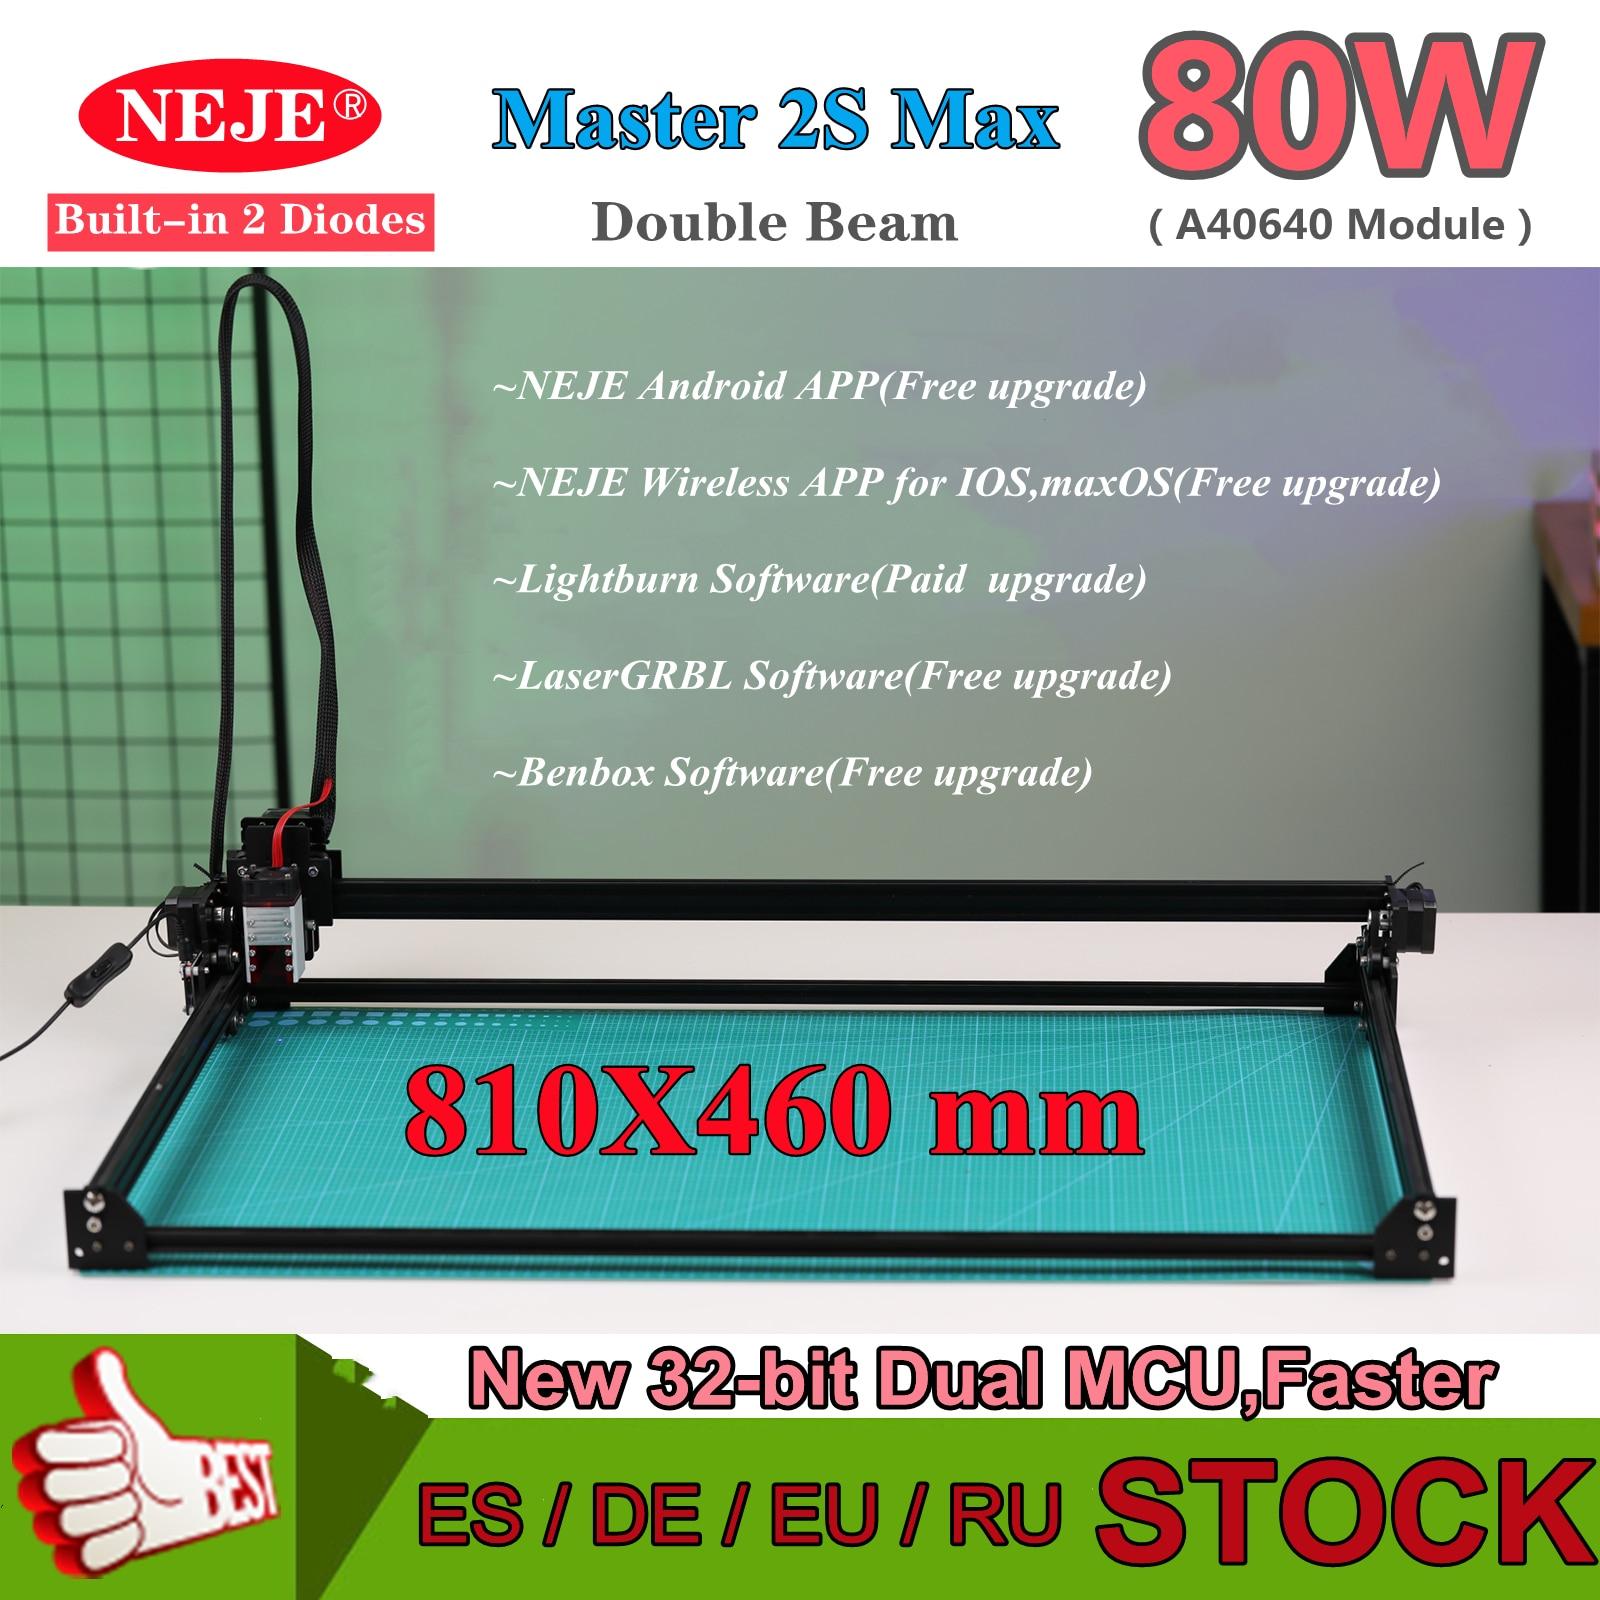 NEJE Master 2s Max 80W High Power CNC Laser Engraver Wood Engraving Cutting Machine 2PCS Diodes APP Control Lightburn LaserGRBL